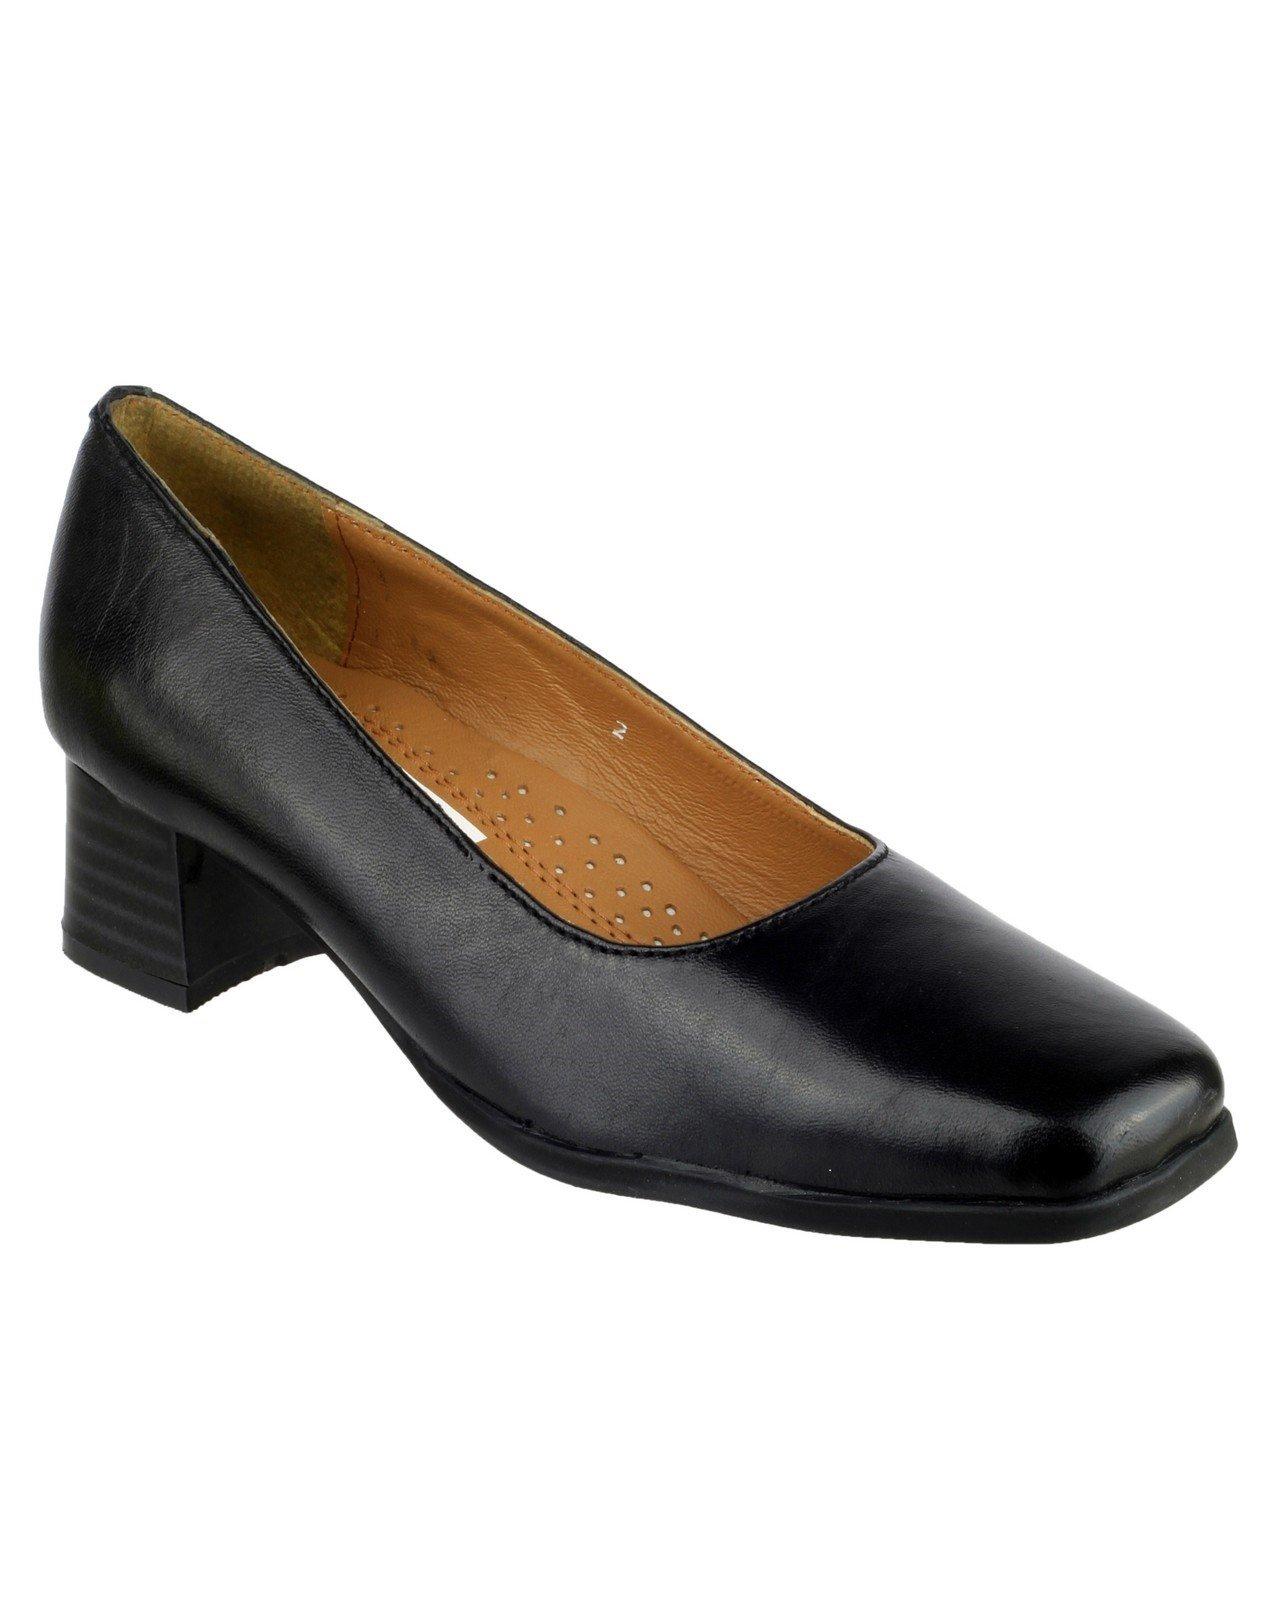 Amblers Women's Walford Ladies Wide Fit Court Shoe Black 15233 - Black 3